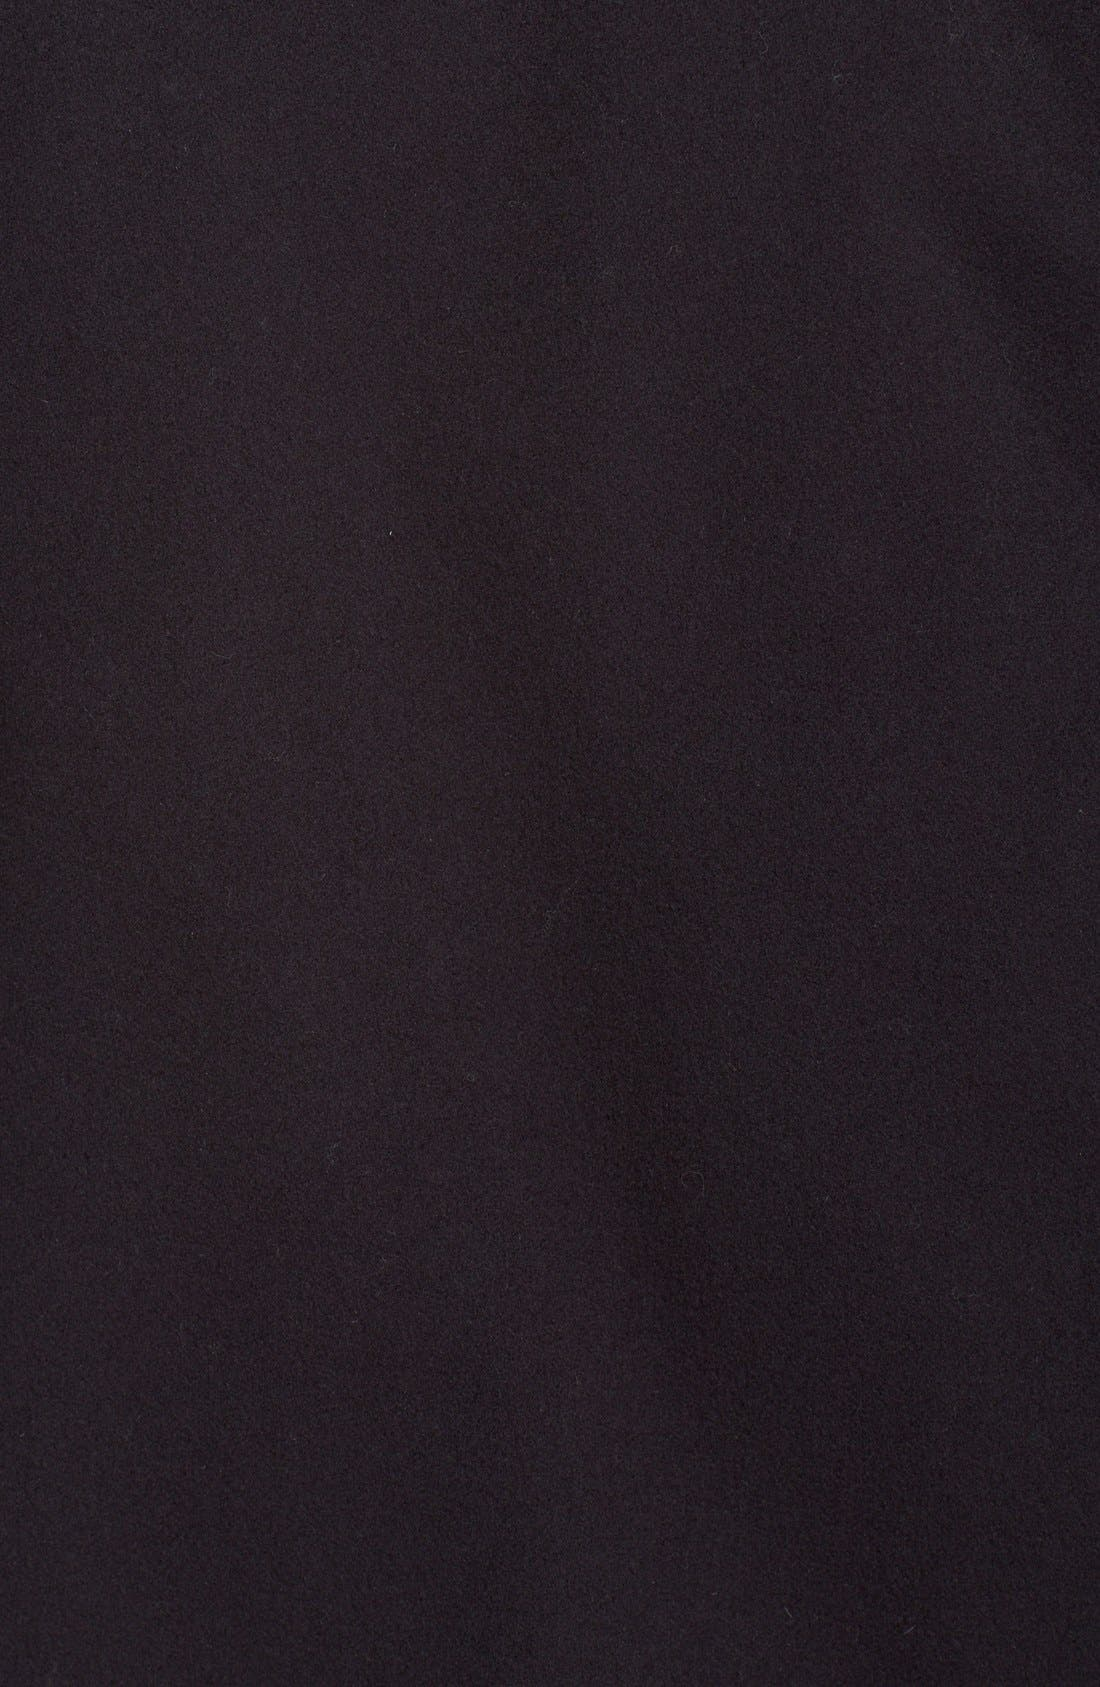 Alternate Image 3  - Eleventy Houndstooth Wool Coat